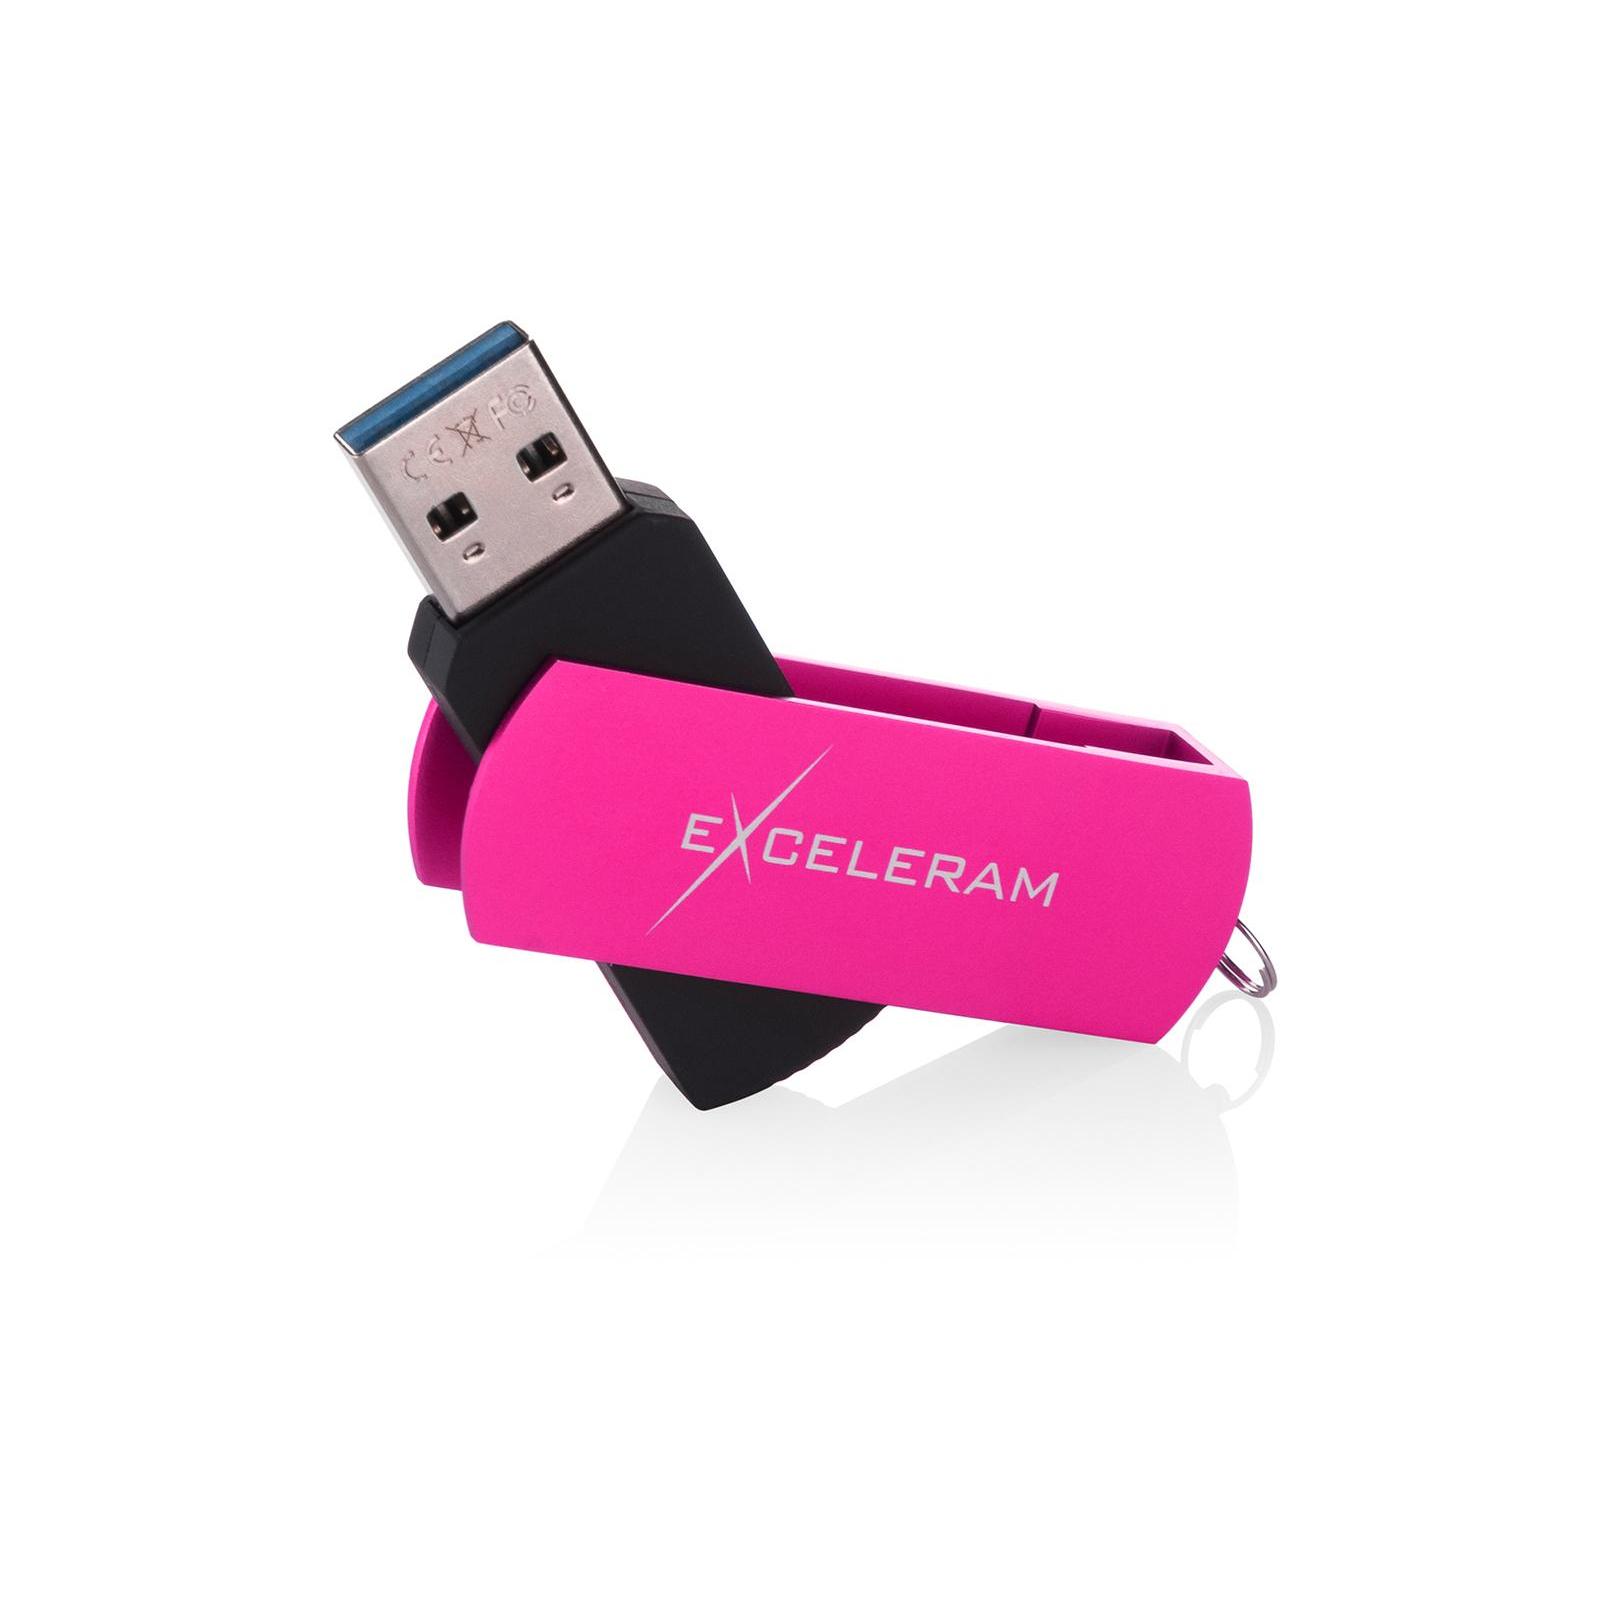 USB флеш накопитель eXceleram 32GB P2 Series Blue/Black USB 3.1 Gen 1 (EXP2U3BLB32) изображение 3